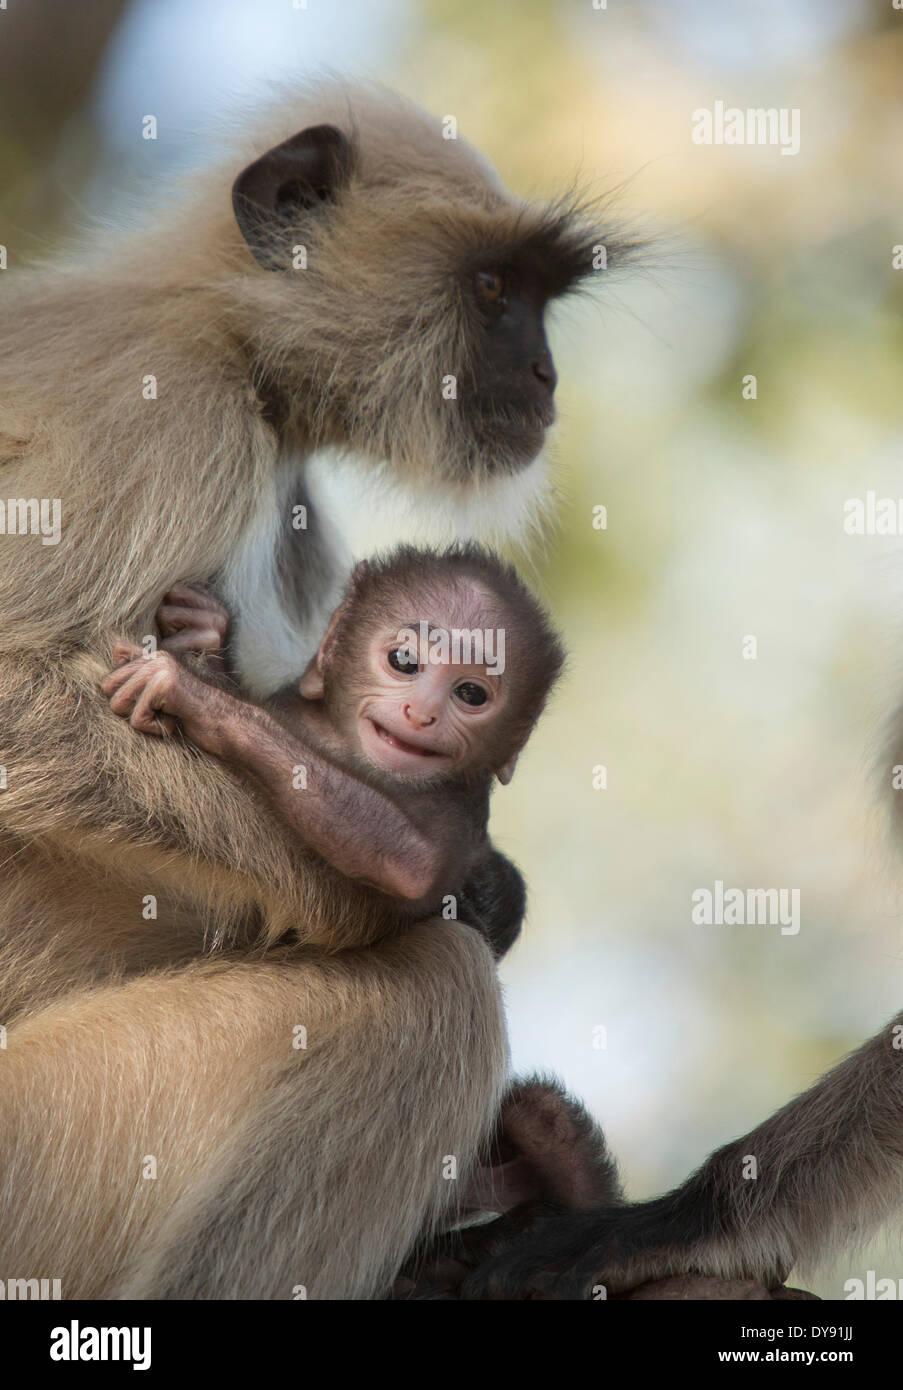 Hulman, Hanuman, indiano, scimmia, Asia, animali, animale femmina, giovani, Immagini Stock